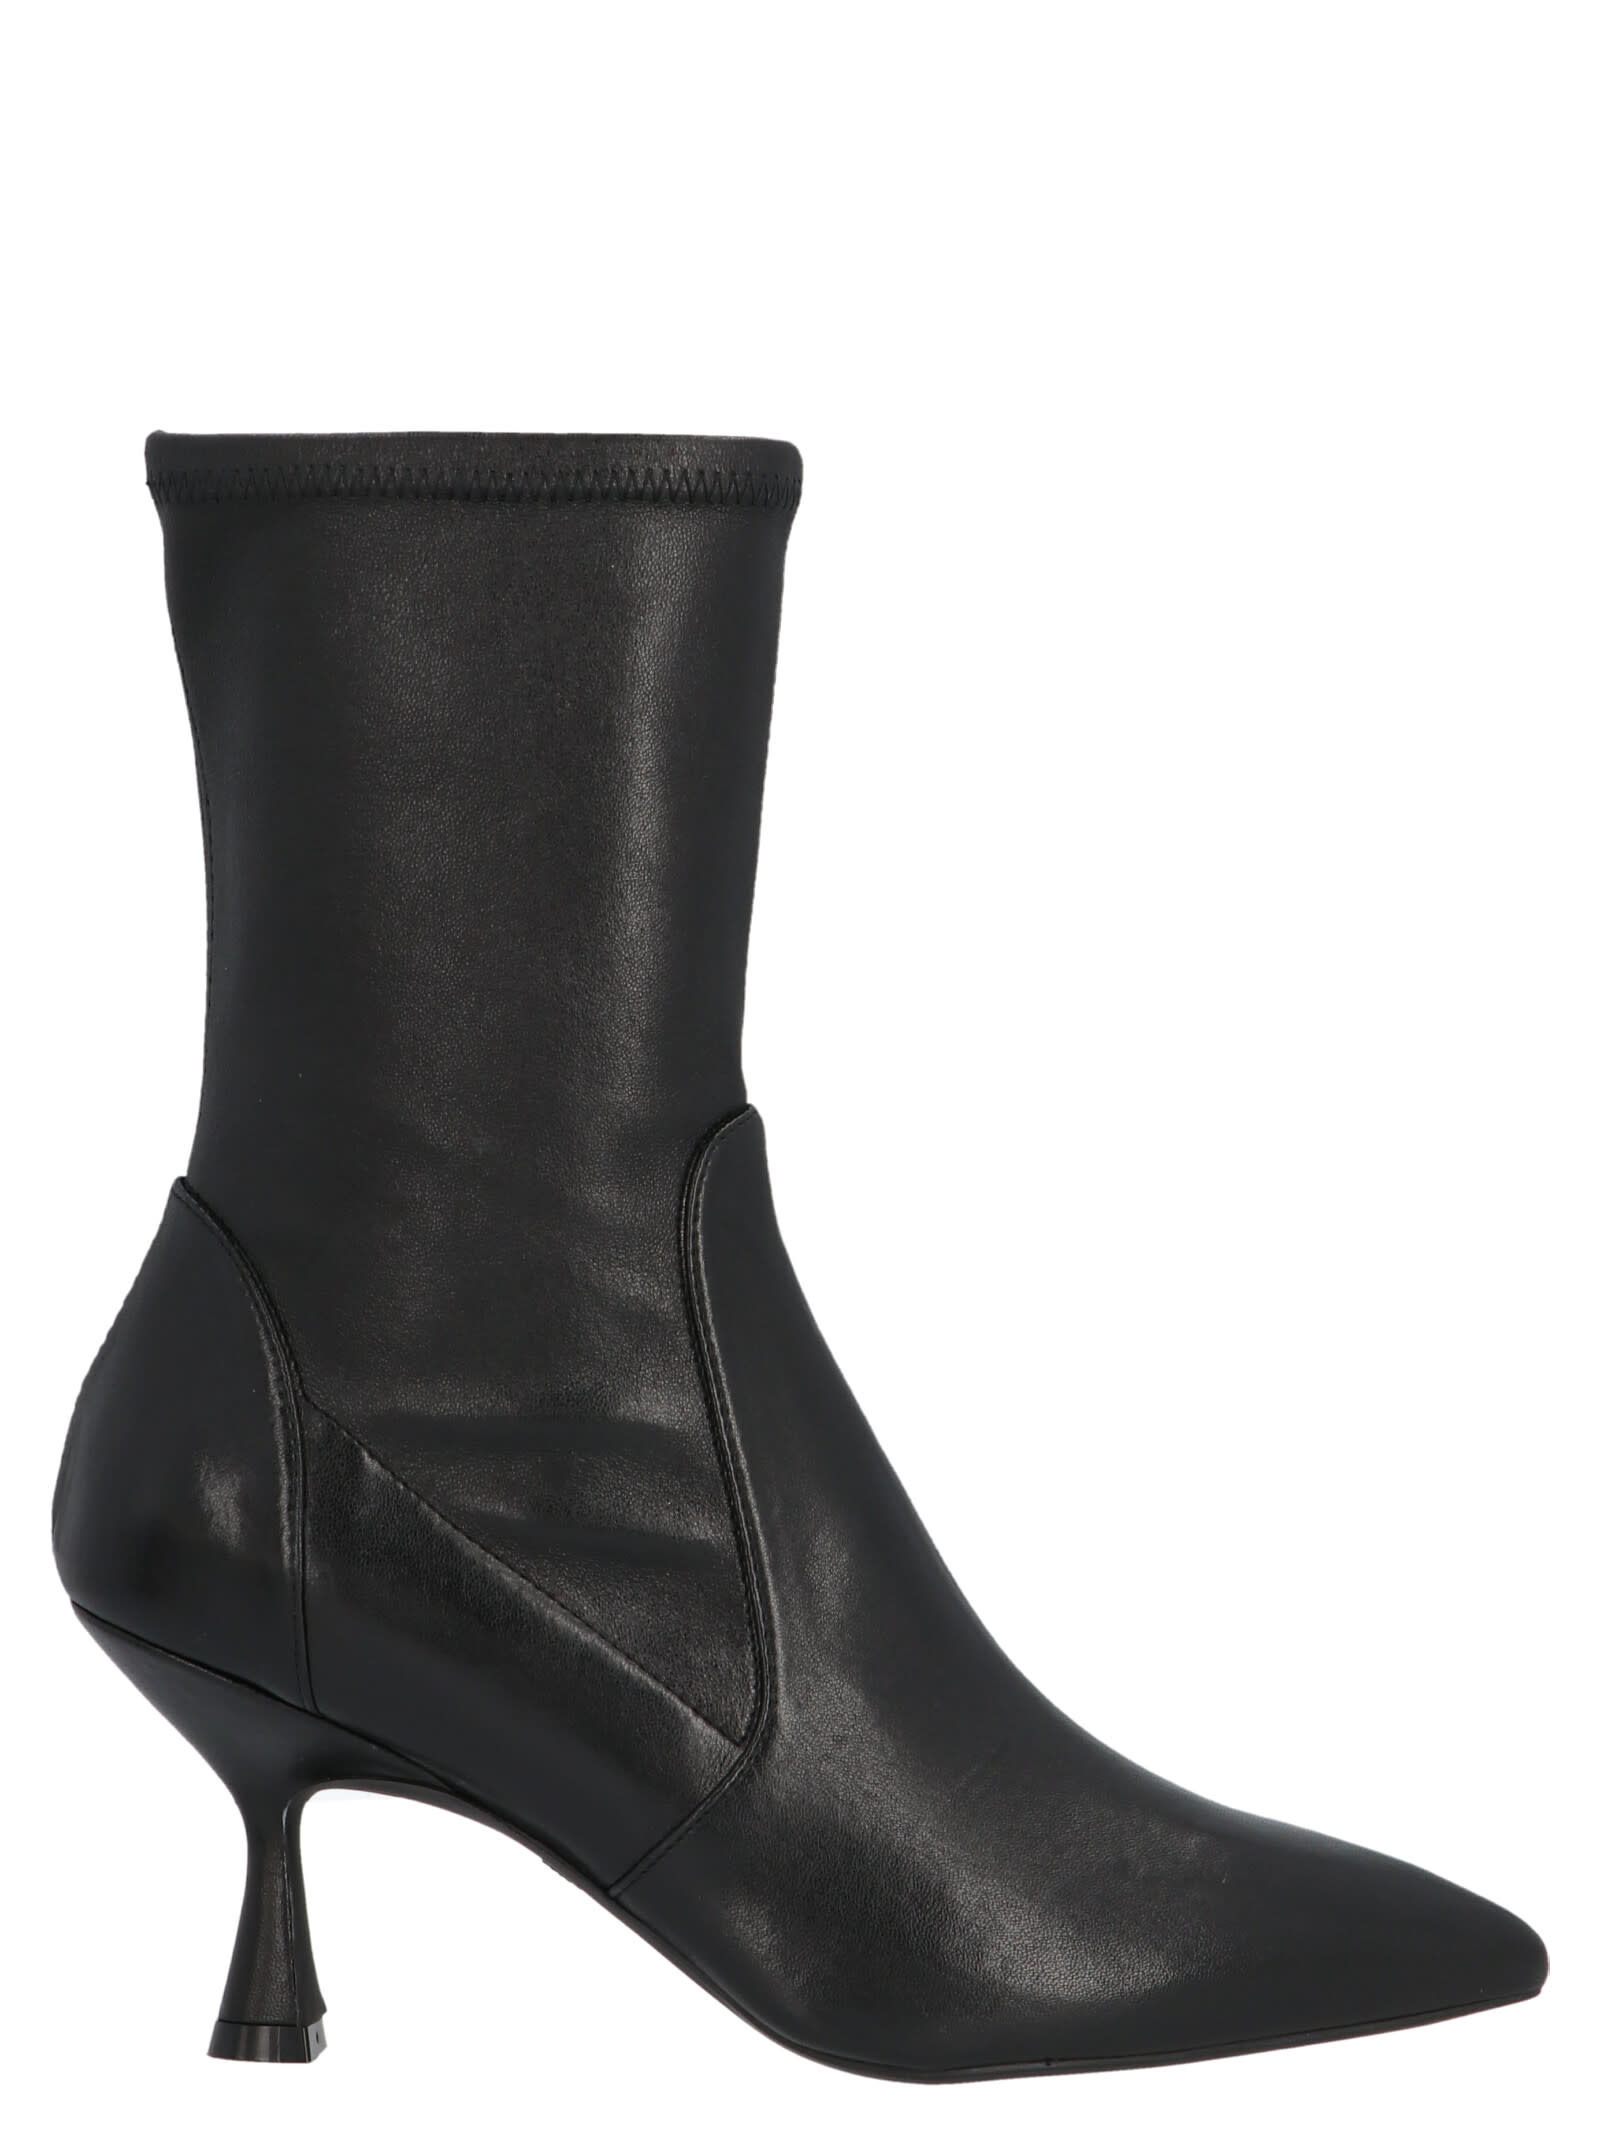 Stuart Weitzman muna Shoes